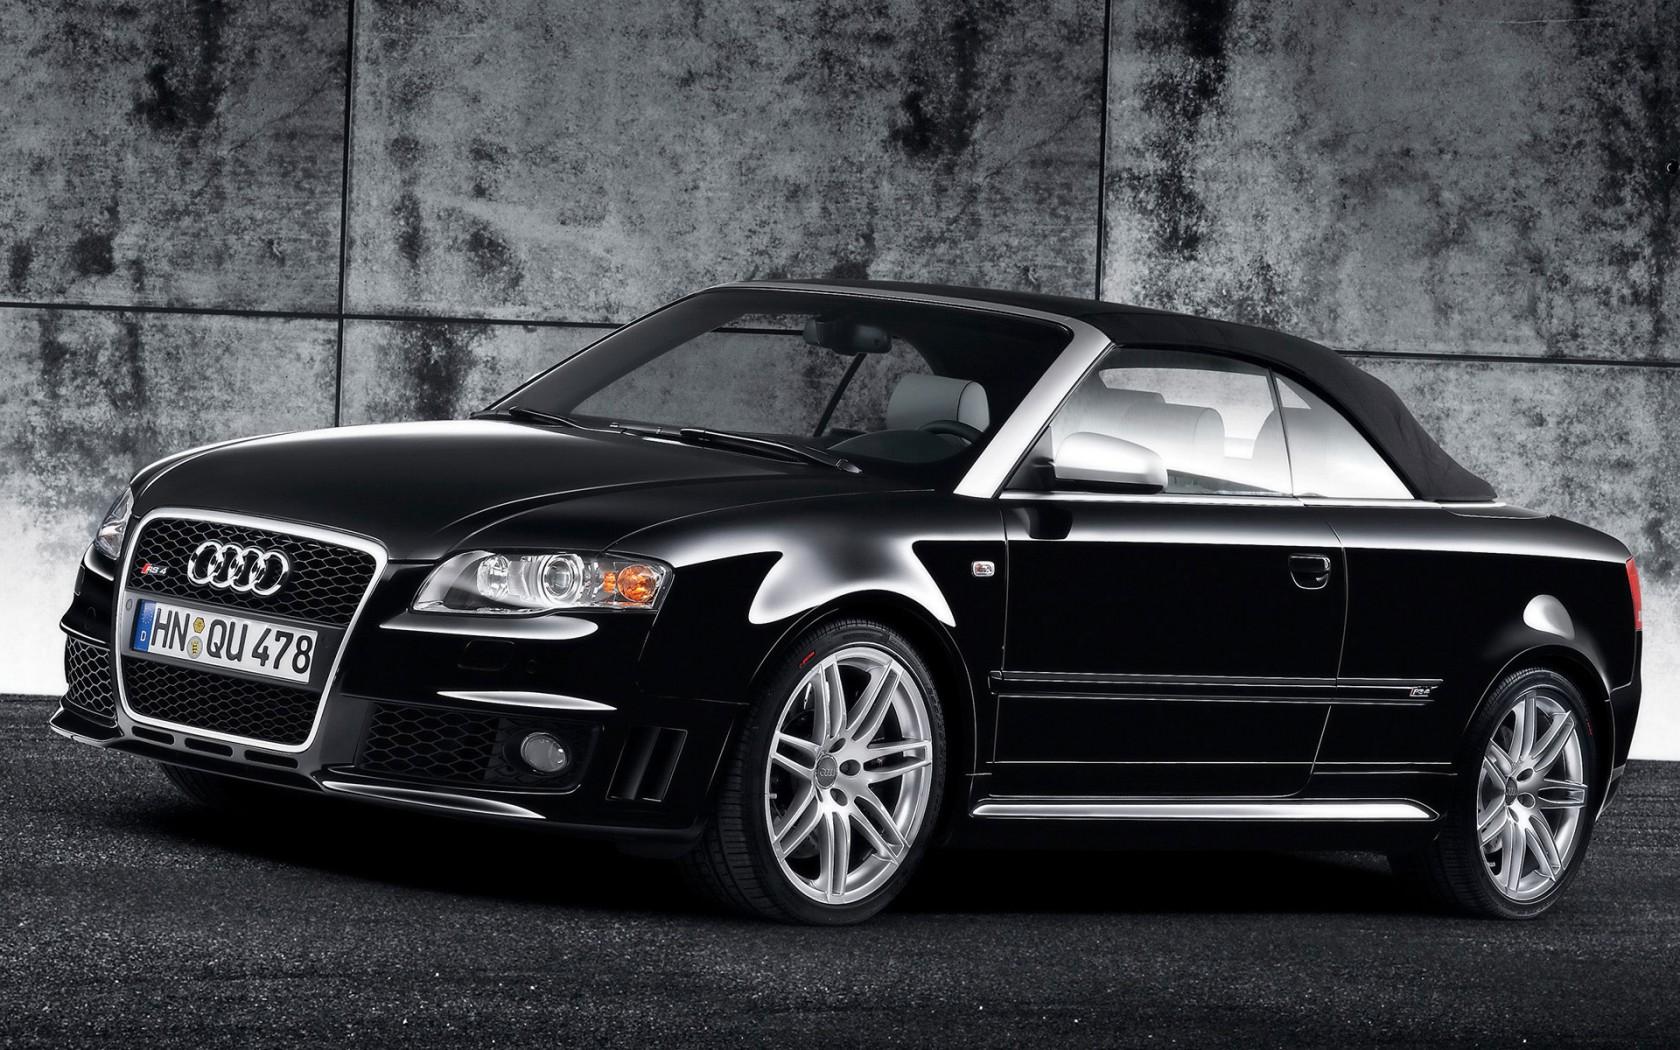 Audi-RS4-Cabriolet-2008